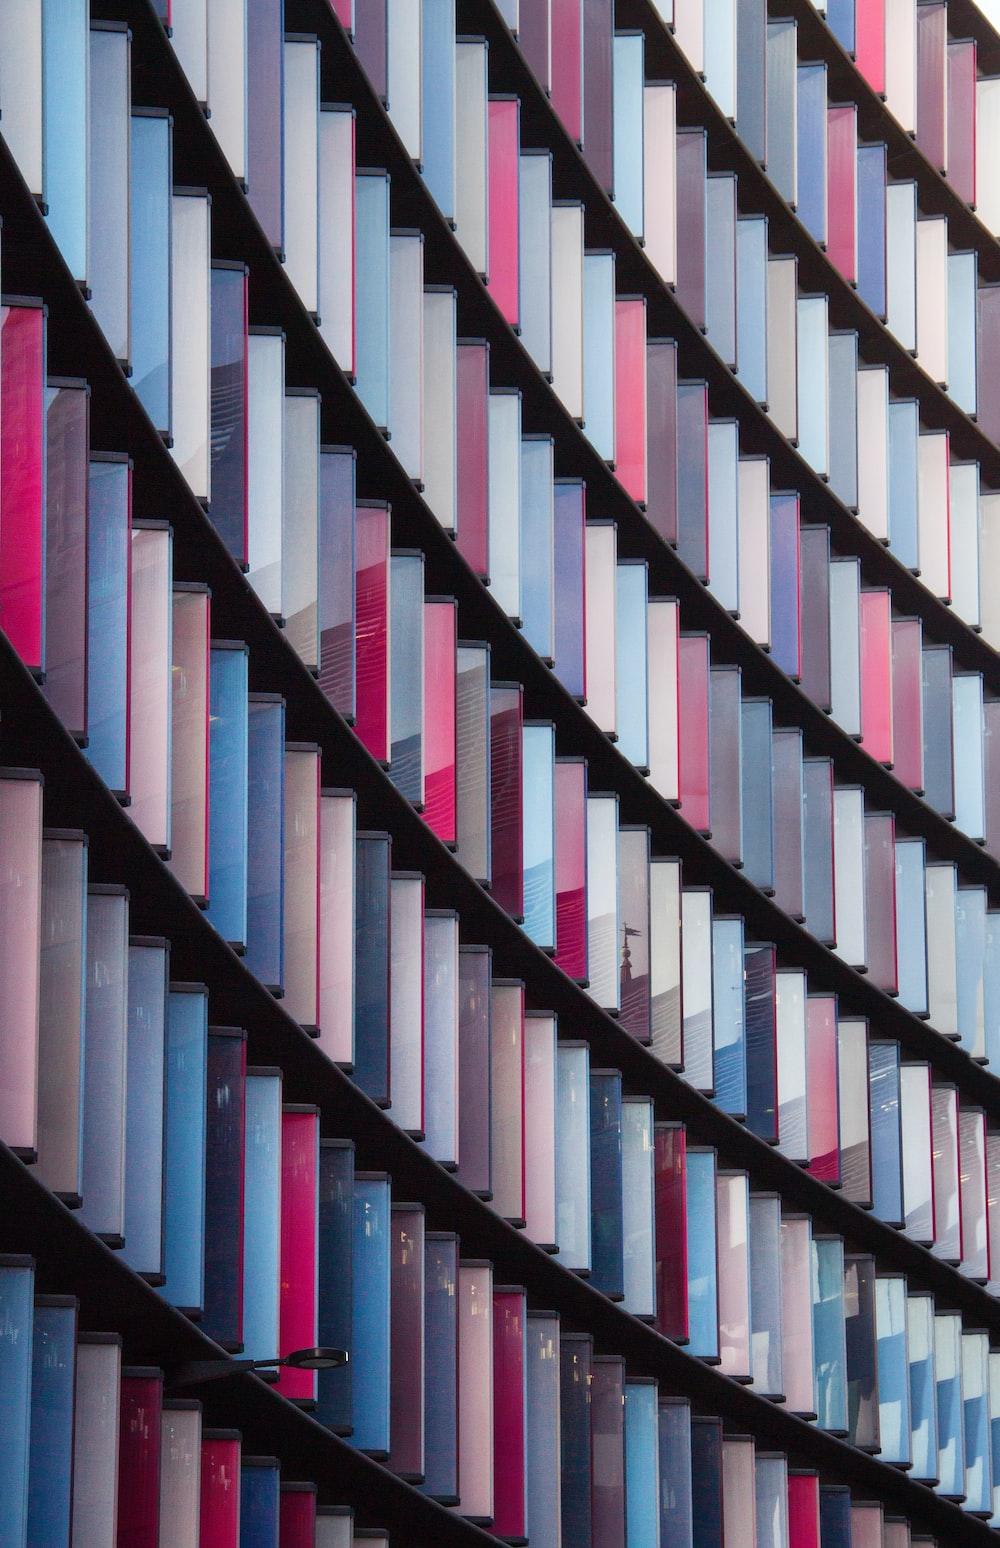 multicolored books on rack